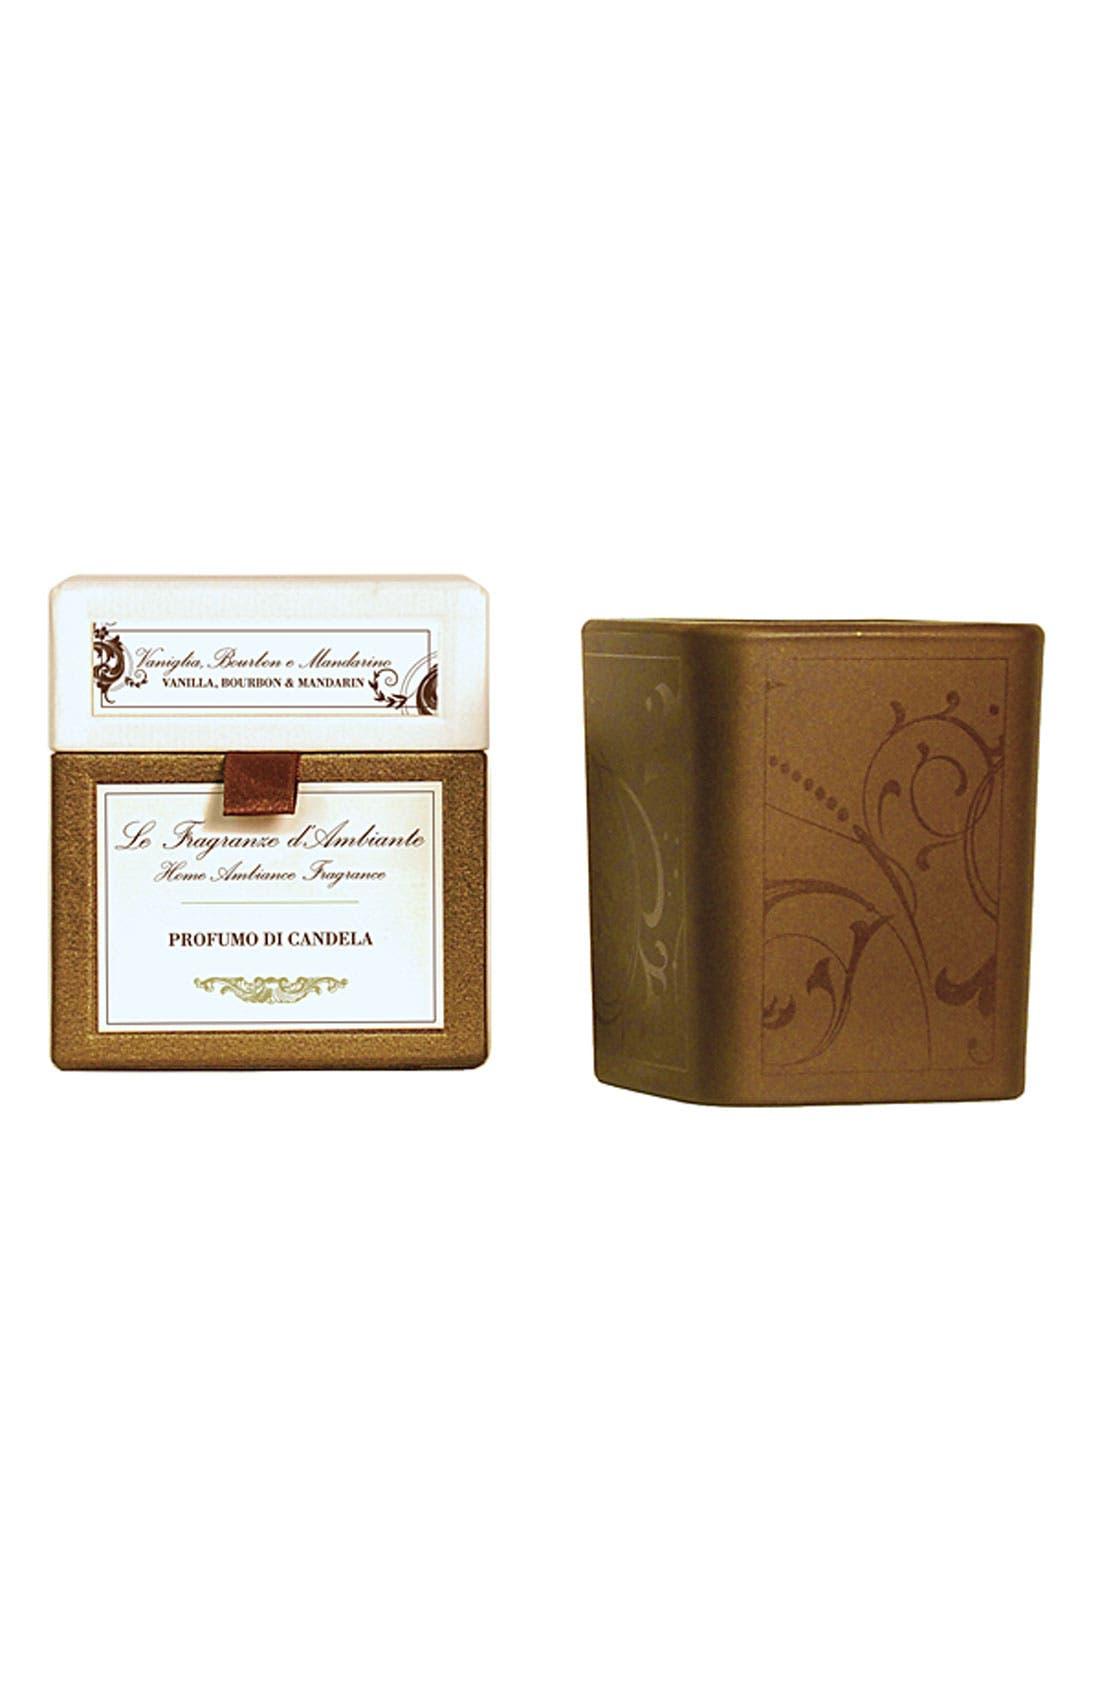 Alternate Image 1 Selected - Antica Farmacista 'Vanilla, Bourbon & Mandarin' Home Ambiance Fragrance